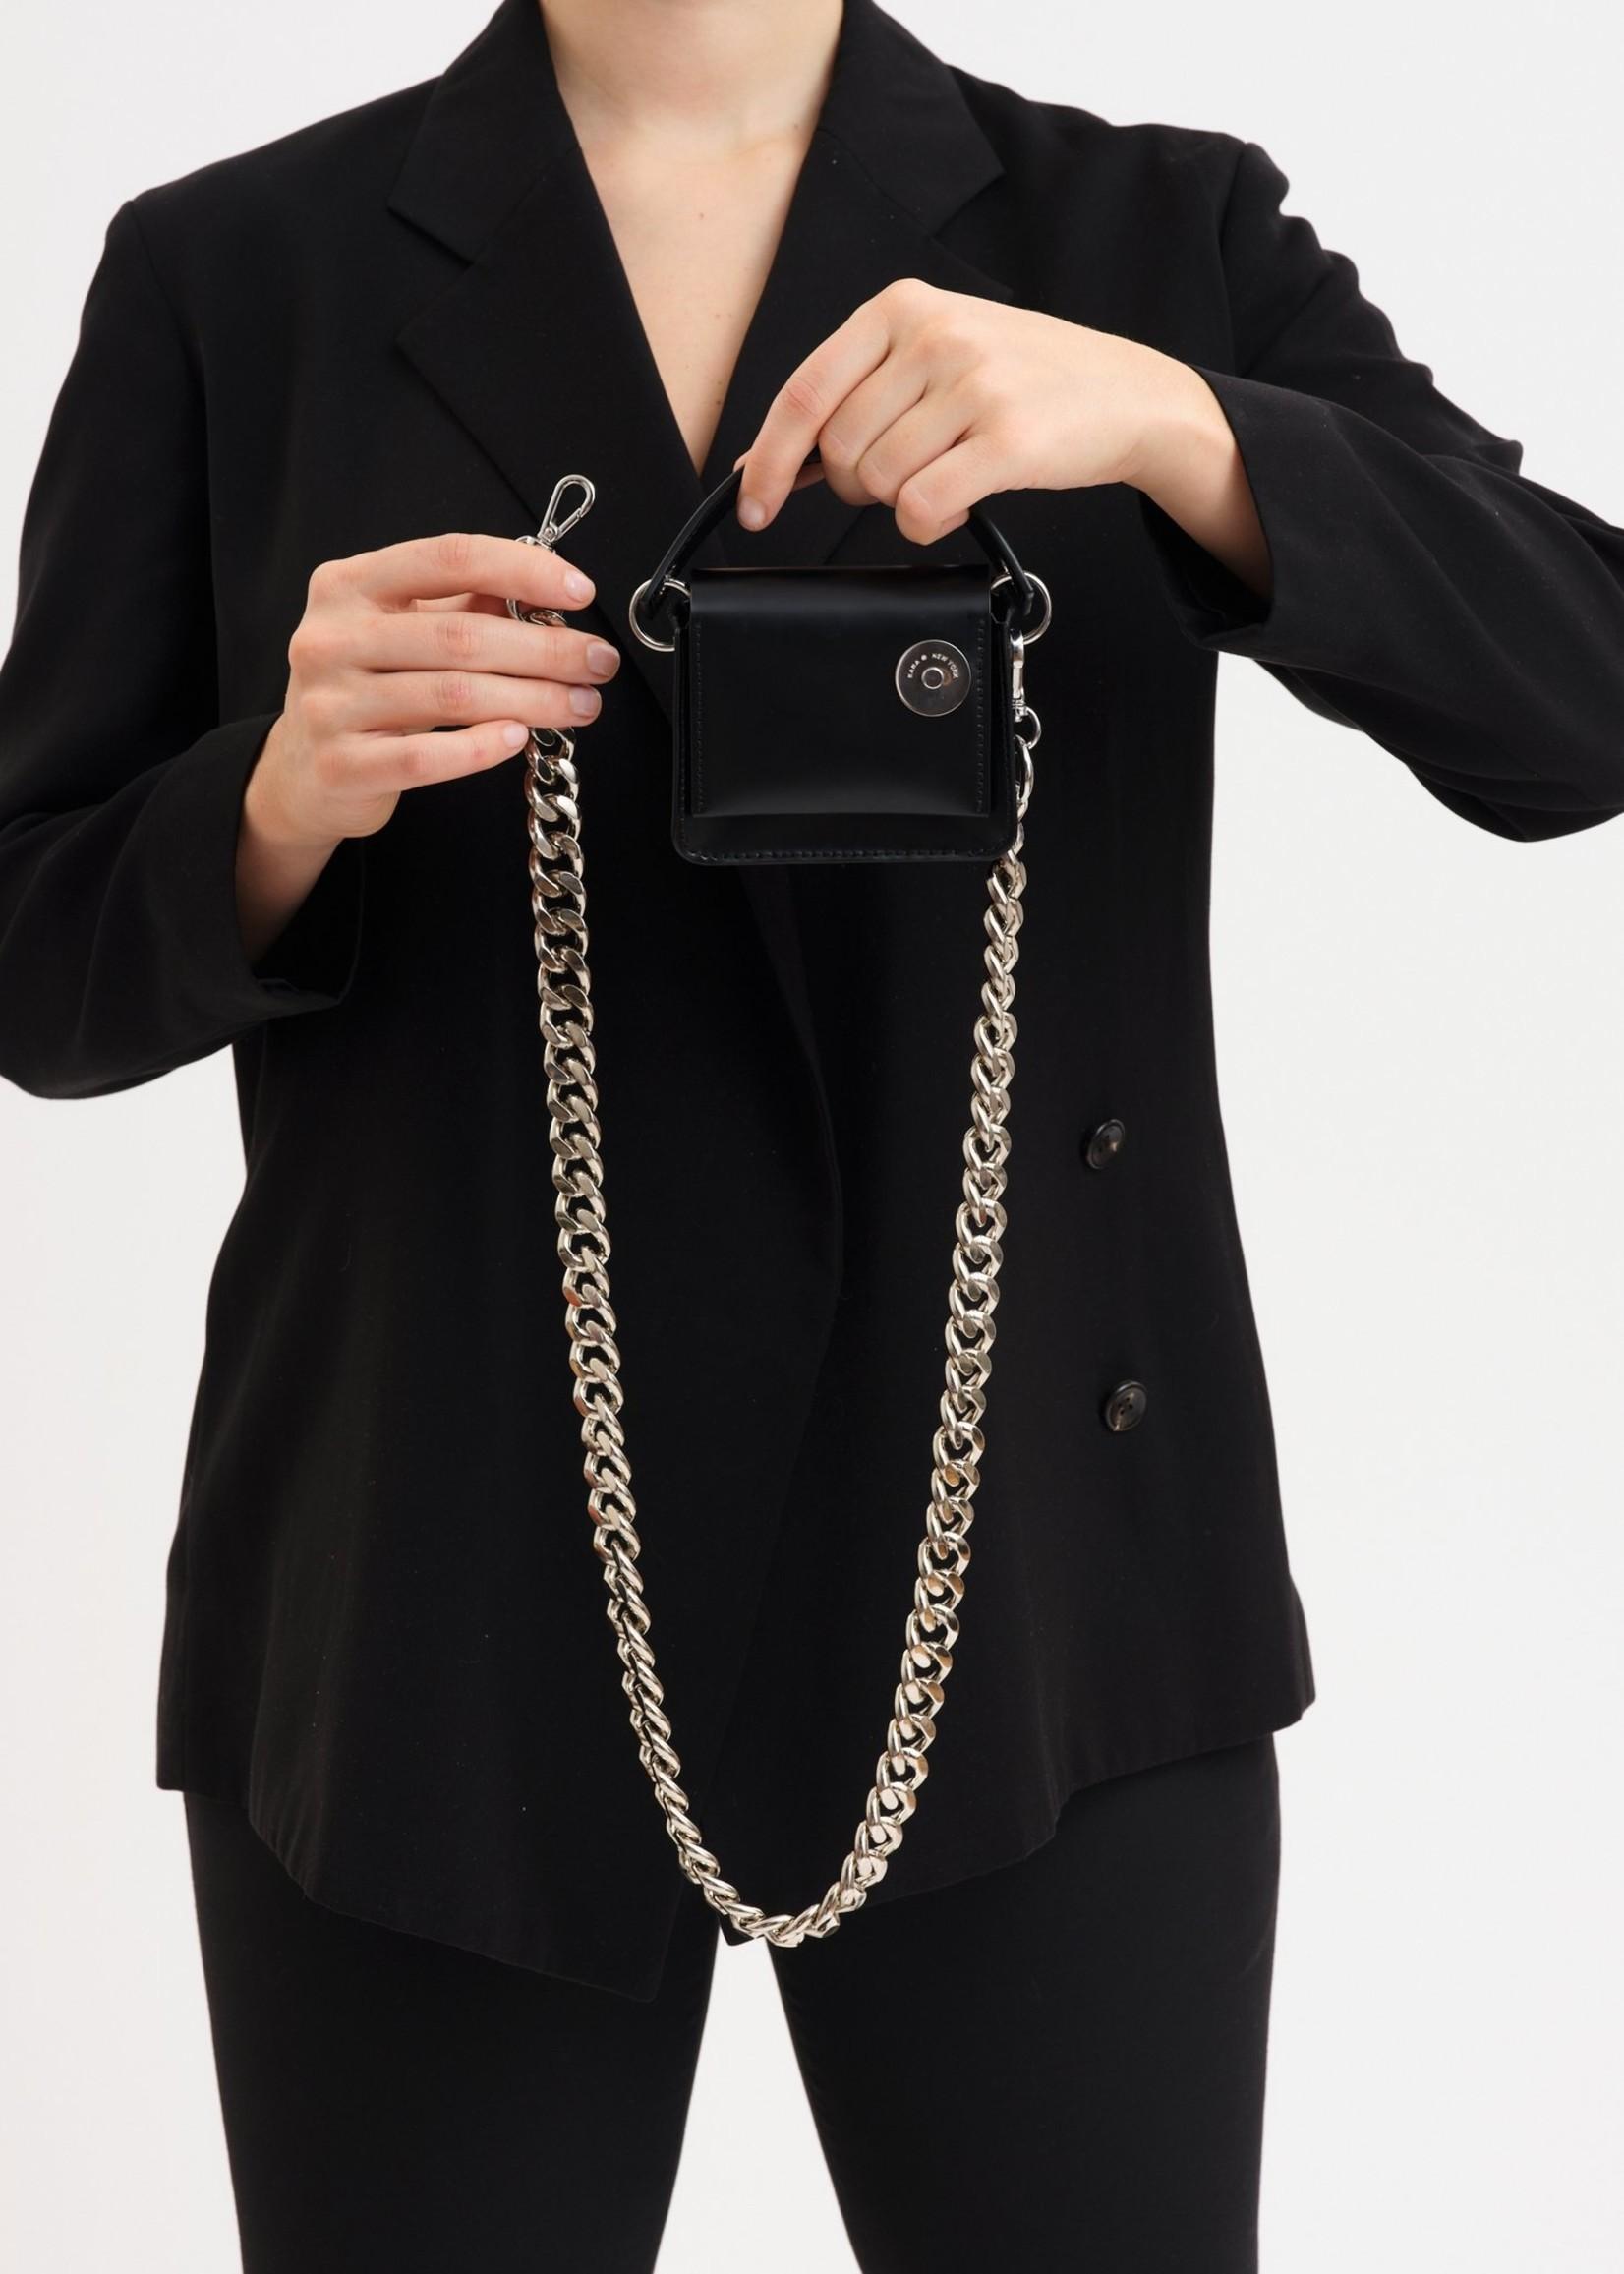 KARA Micro Pinch Chain Bag in Slime